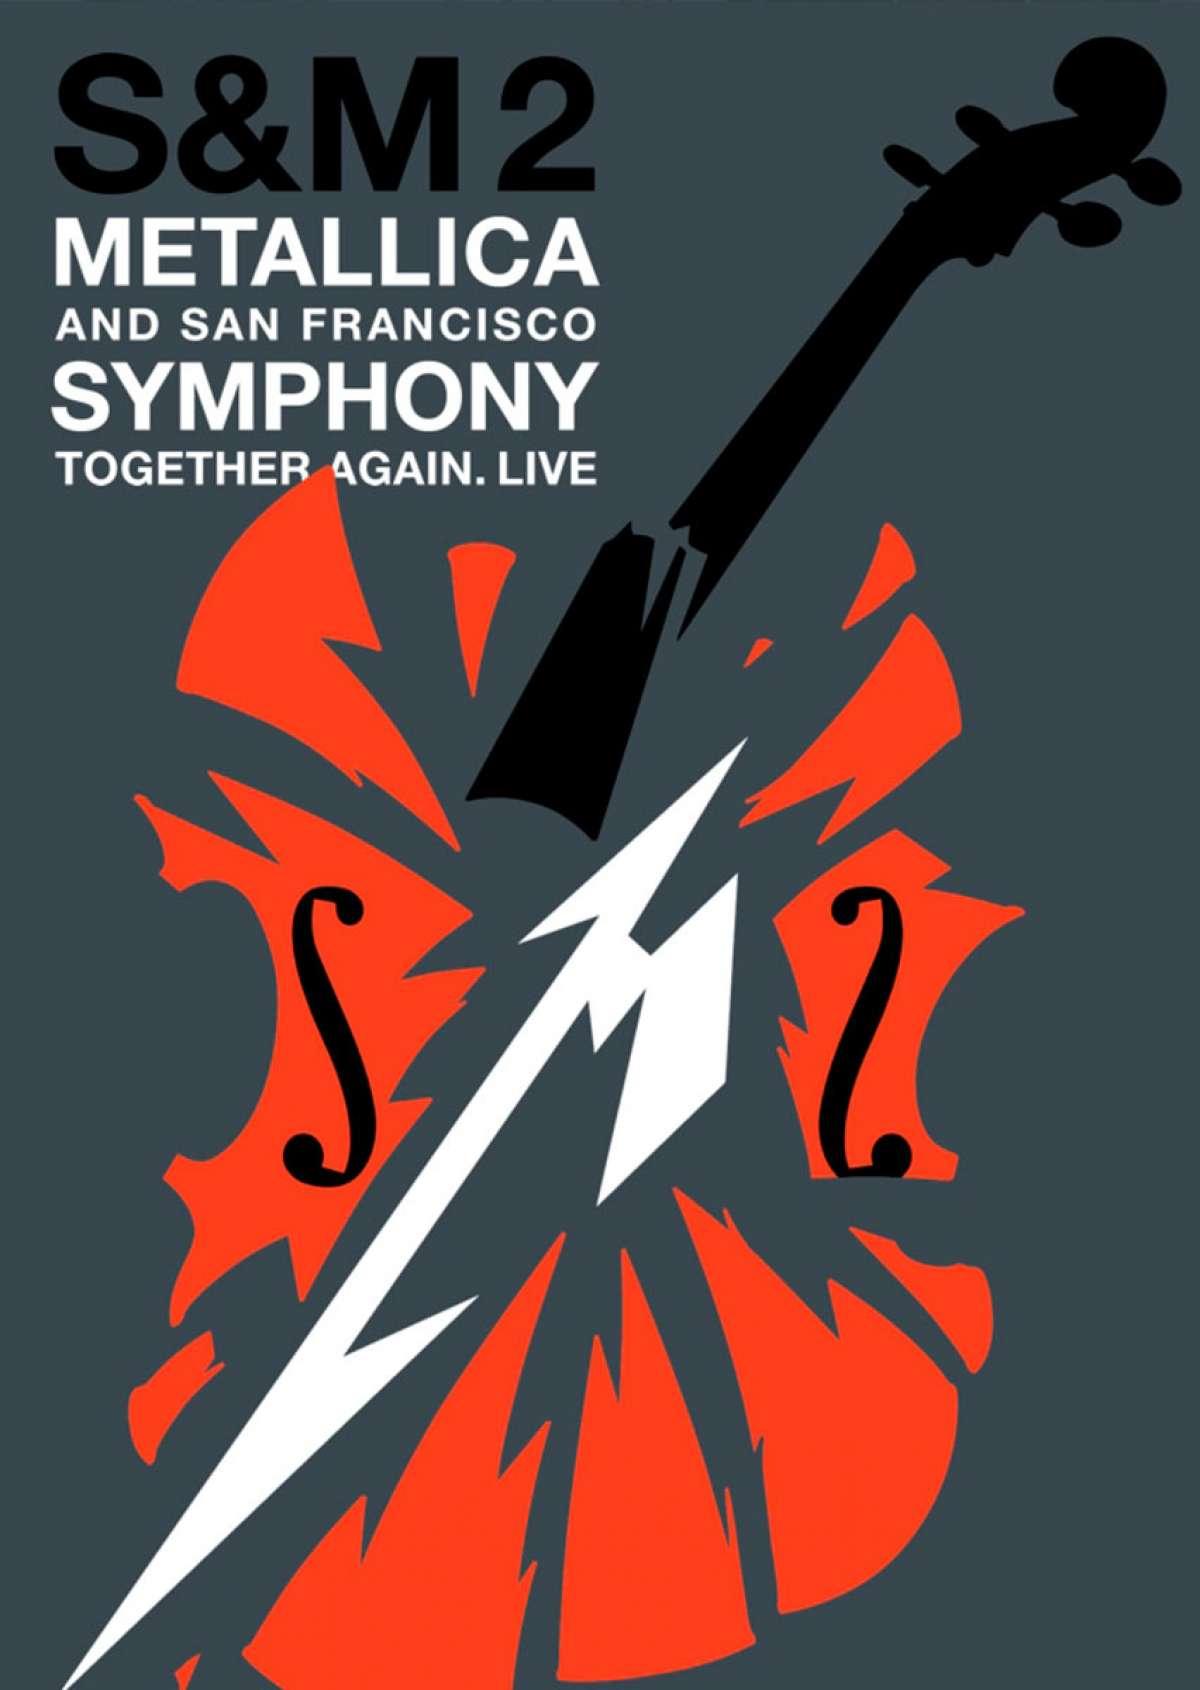 Metallica & San Francisco Symphony: SM2 - Metallica & San Francisco Symphony - Cine-Royal  - Fritzlar